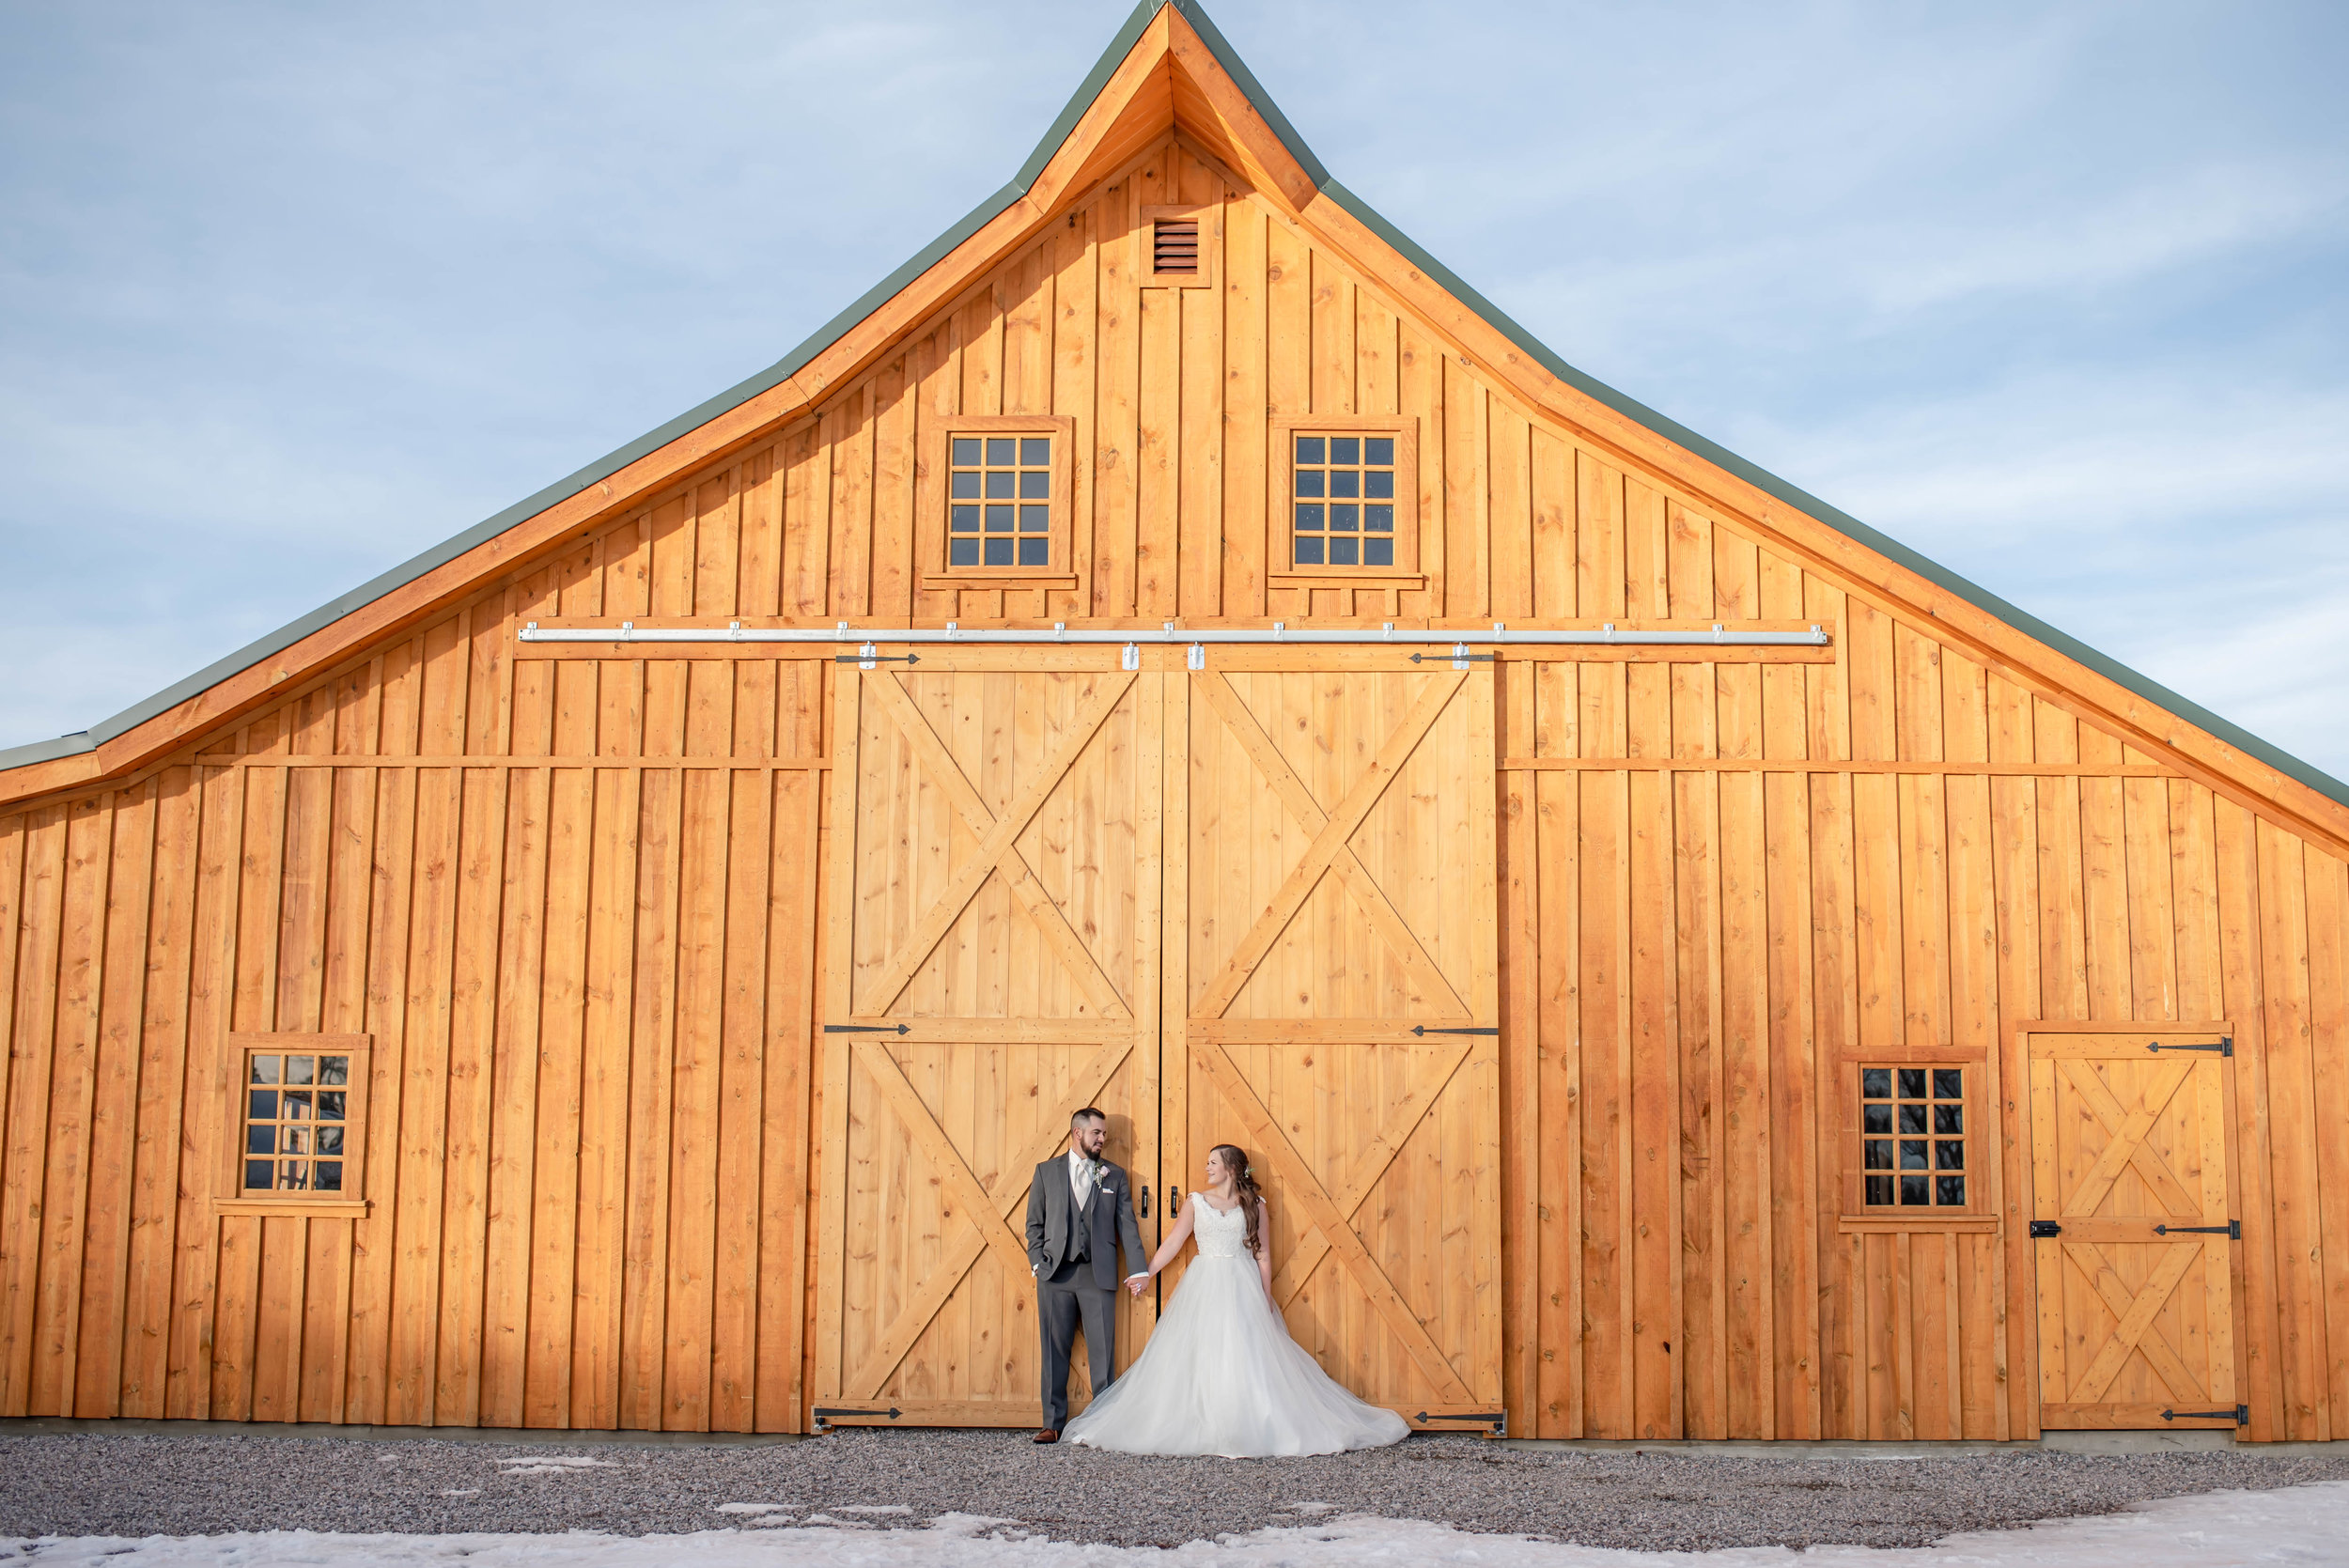 barn weddings, Log River Ranch, bridal gowns.jpg